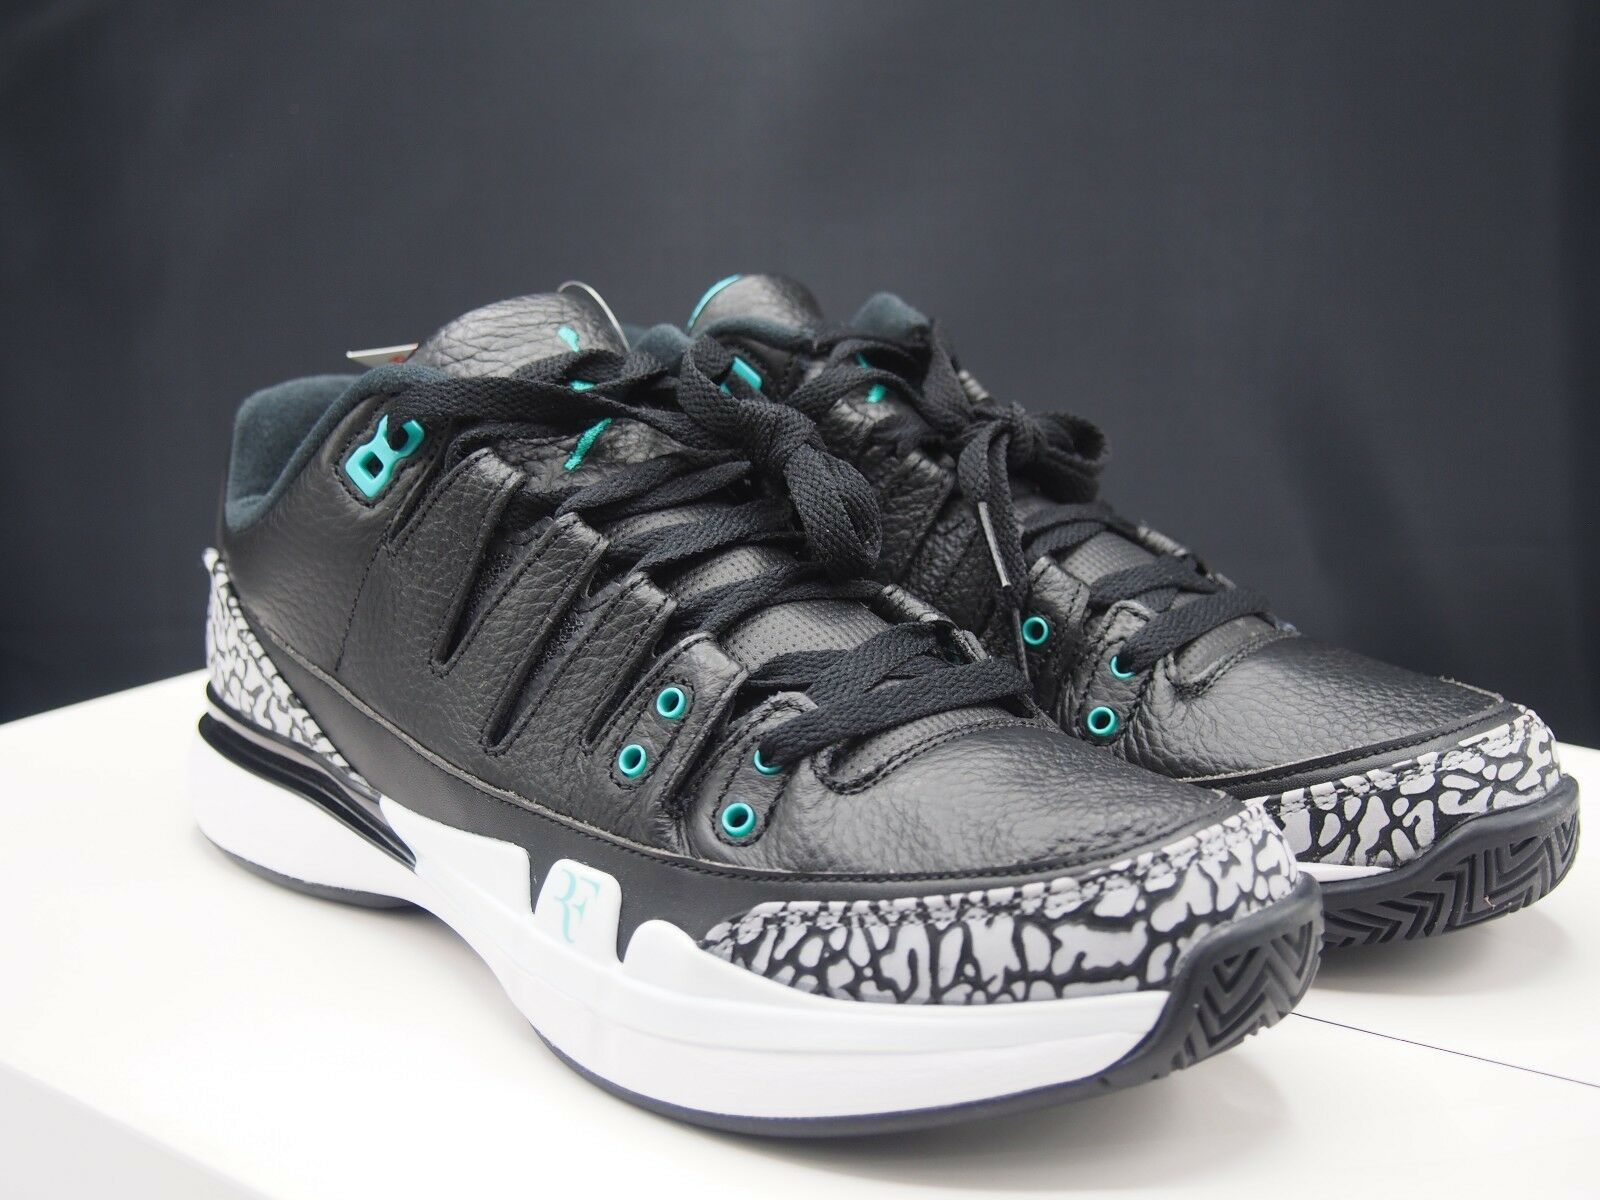 70b48909b1d9 Nike Zoom Vapor RF X Aj3 Roger Federer Air Jordan 3 Atmos Sz 8 for ...